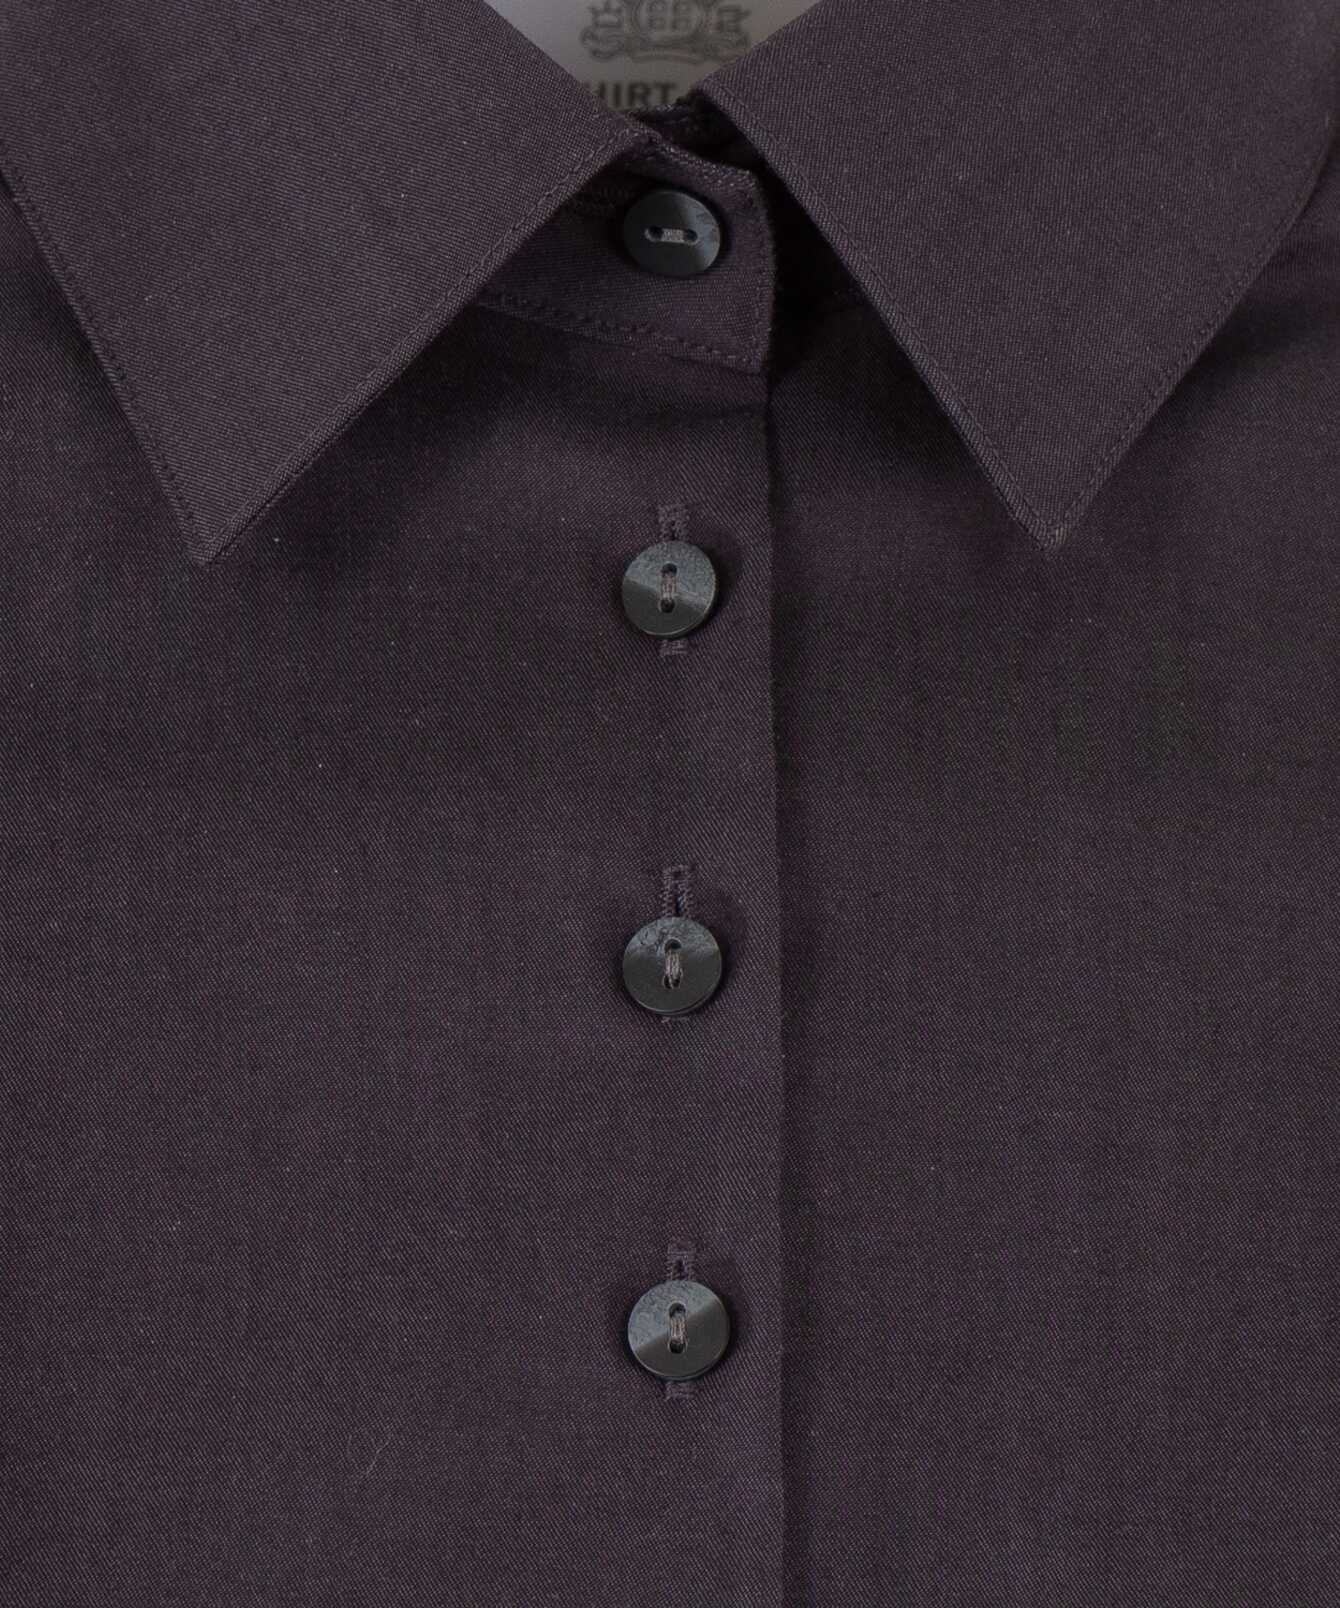 Shirt Moa Grand Twill Non-Iron The Shirt Factory